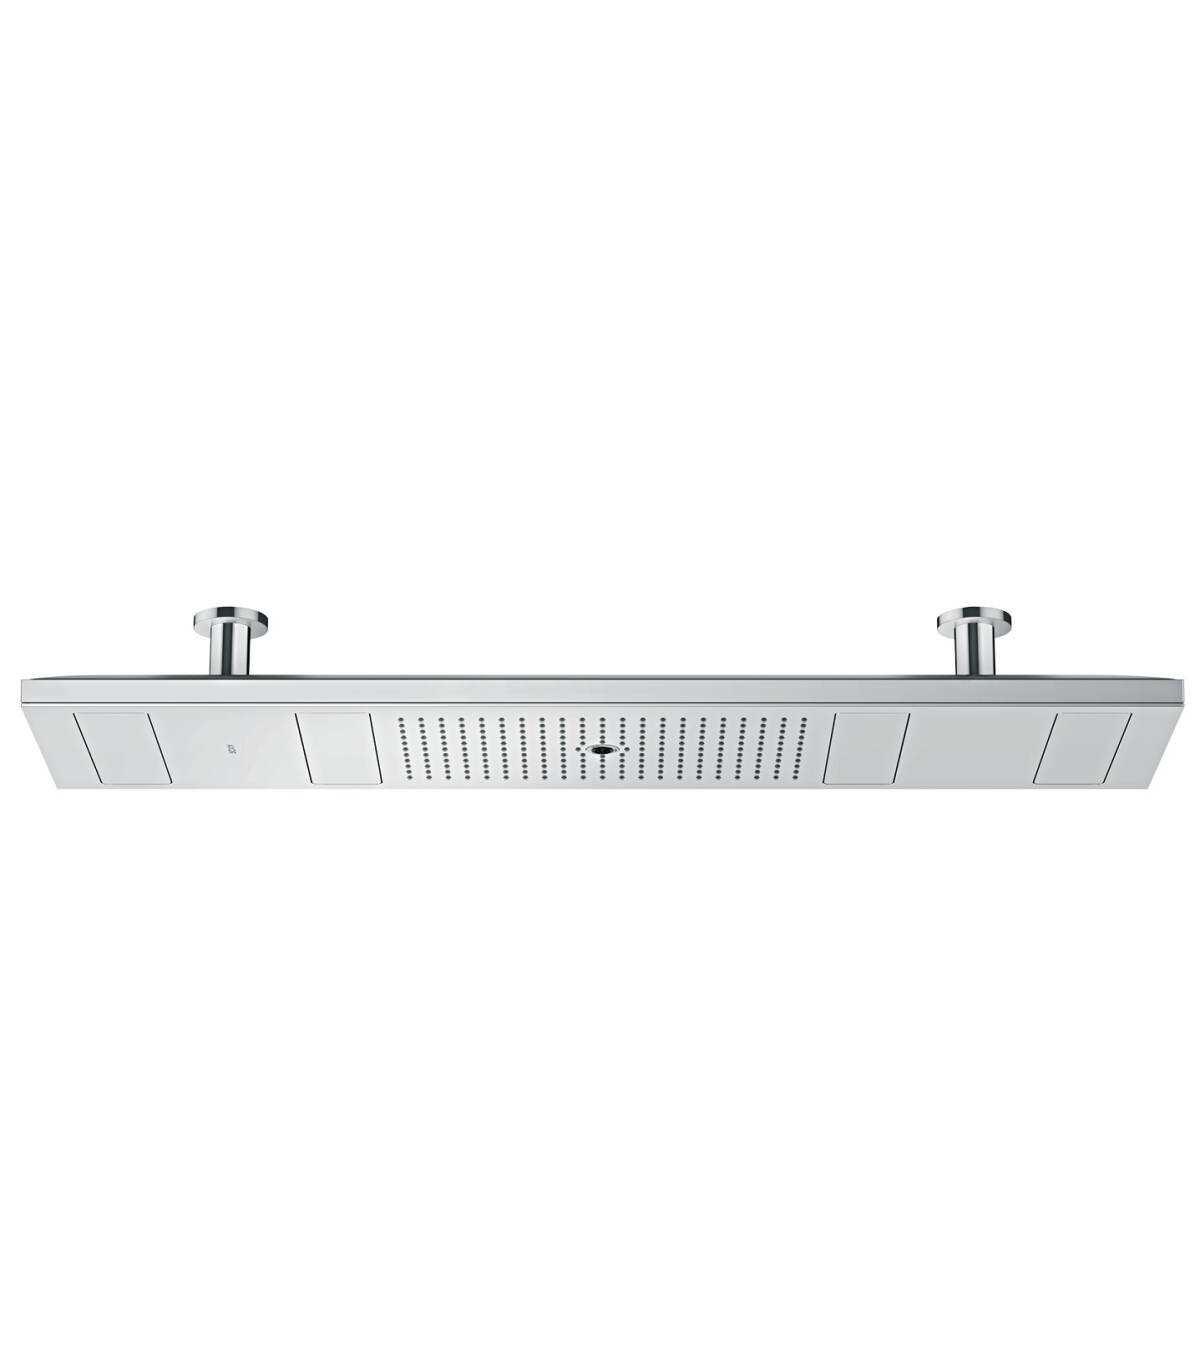 ShowerHeaven 1200/300 4jet with lighting 3500 K, Chrome, 10629000